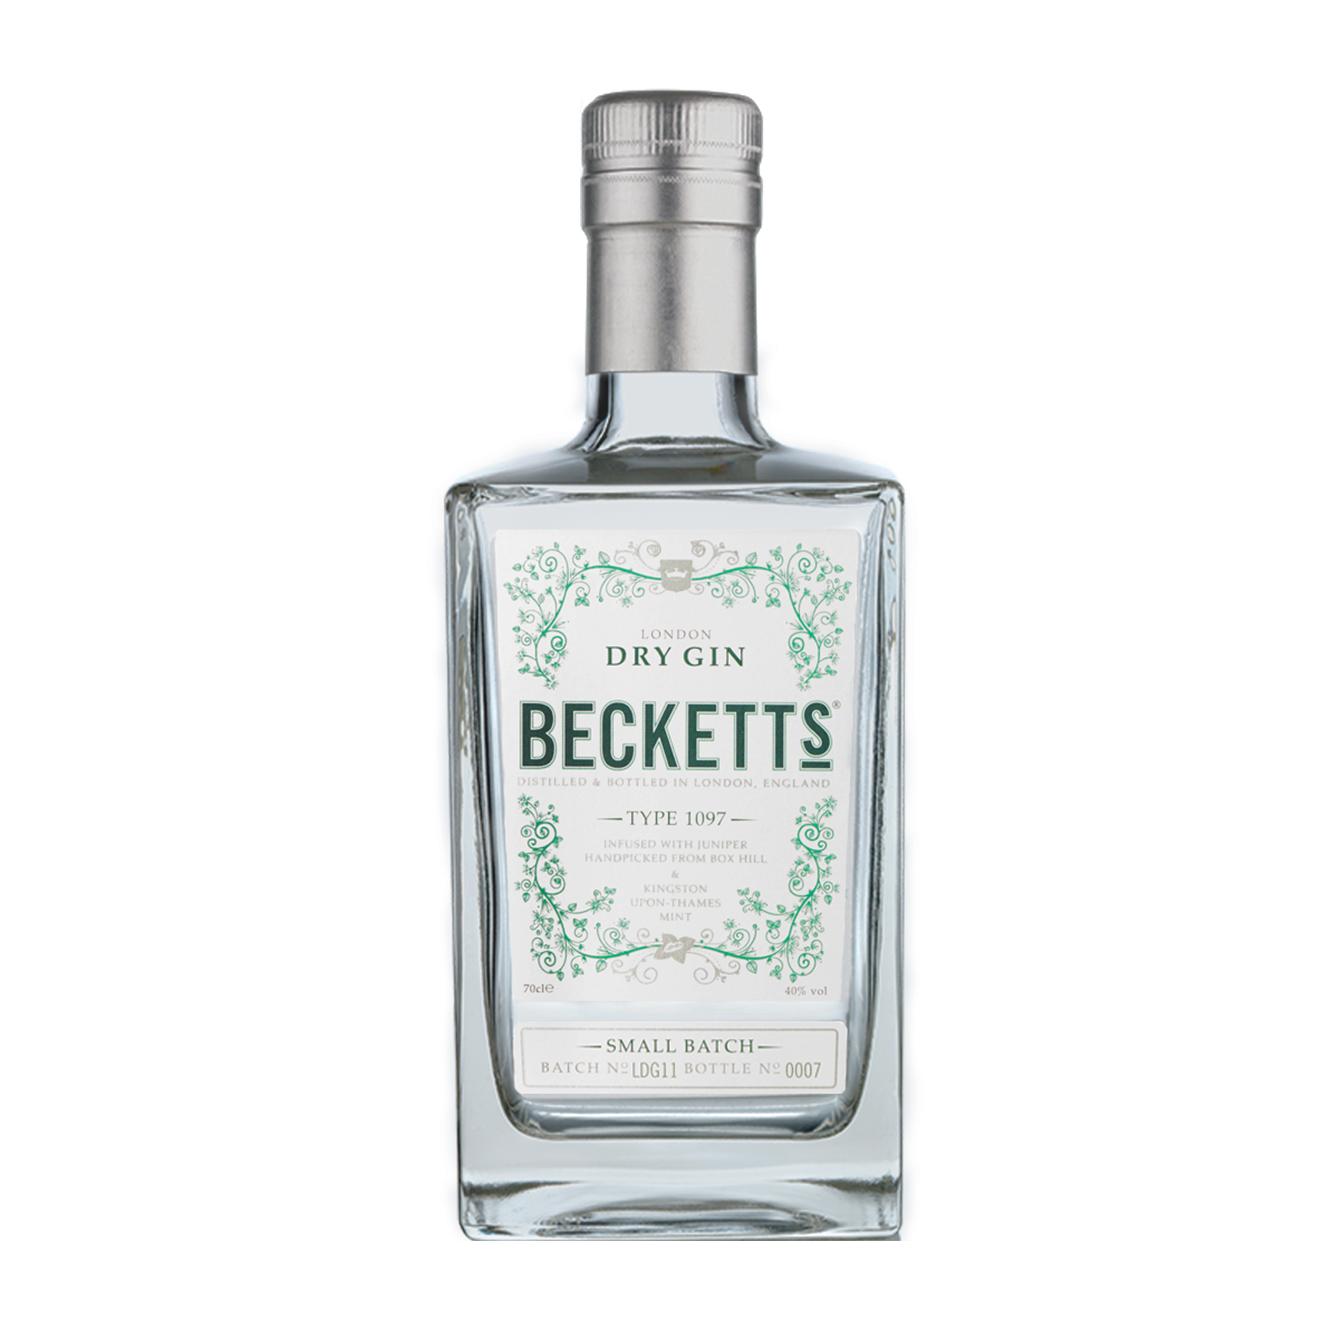 Becketts London Dry Gin